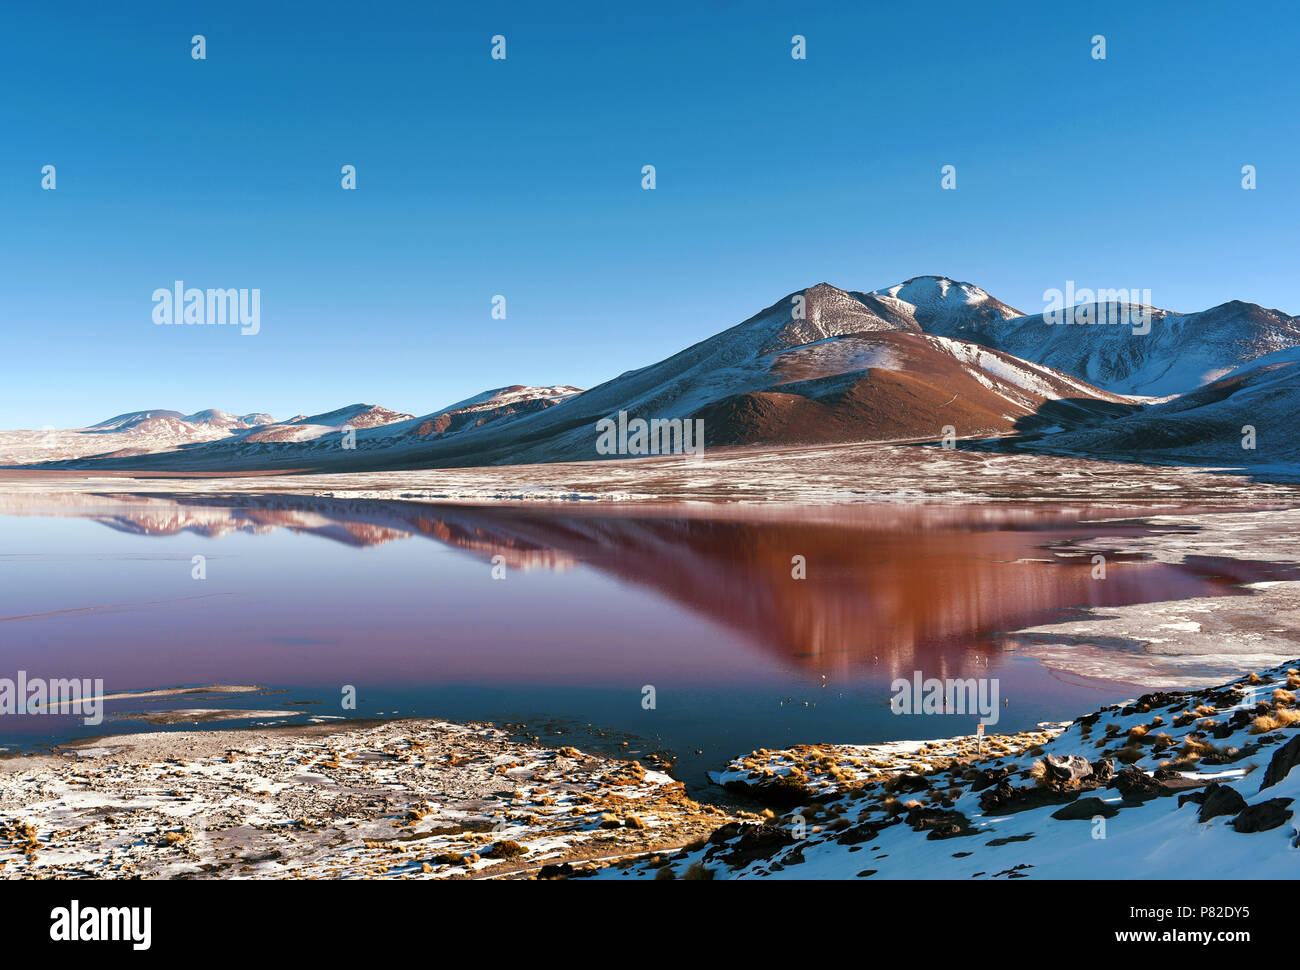 La Laguna Colorada (rojo) La laguna somera Salt Lake en el sudoeste de Bolivia, dentro de Fauna Andina Eduardo Avaroa Reserva Nacional. Imagen De Stock